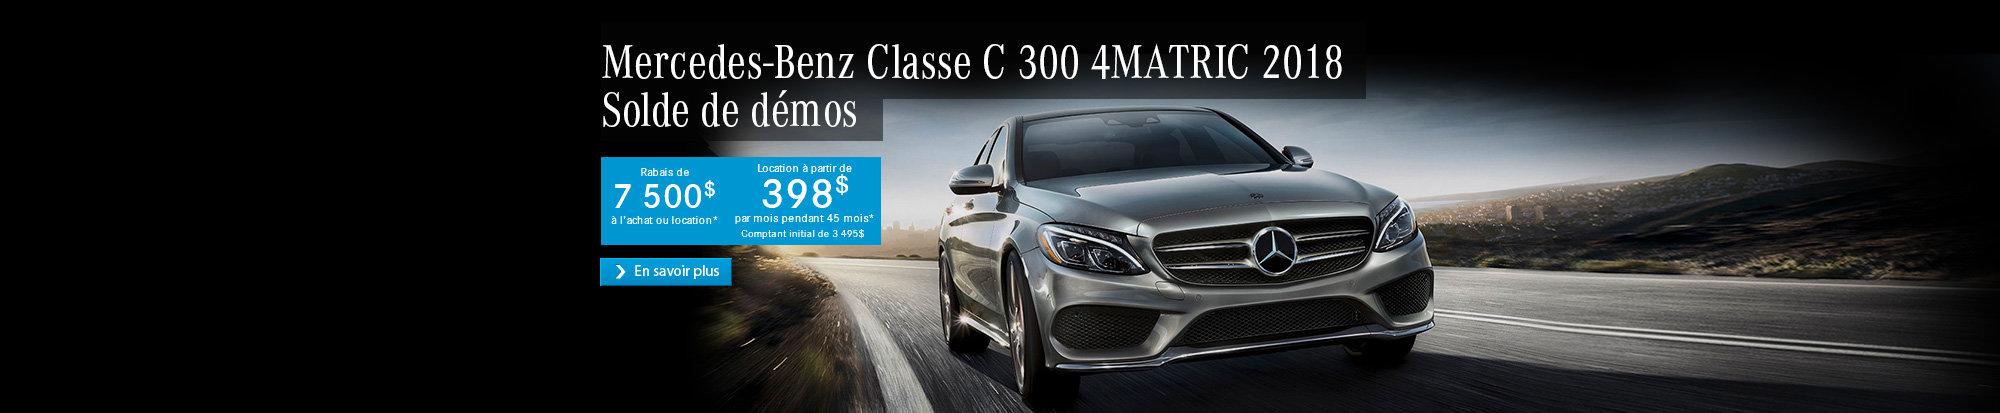 Démos Mercedes Classe C 300 4MATIC 2018